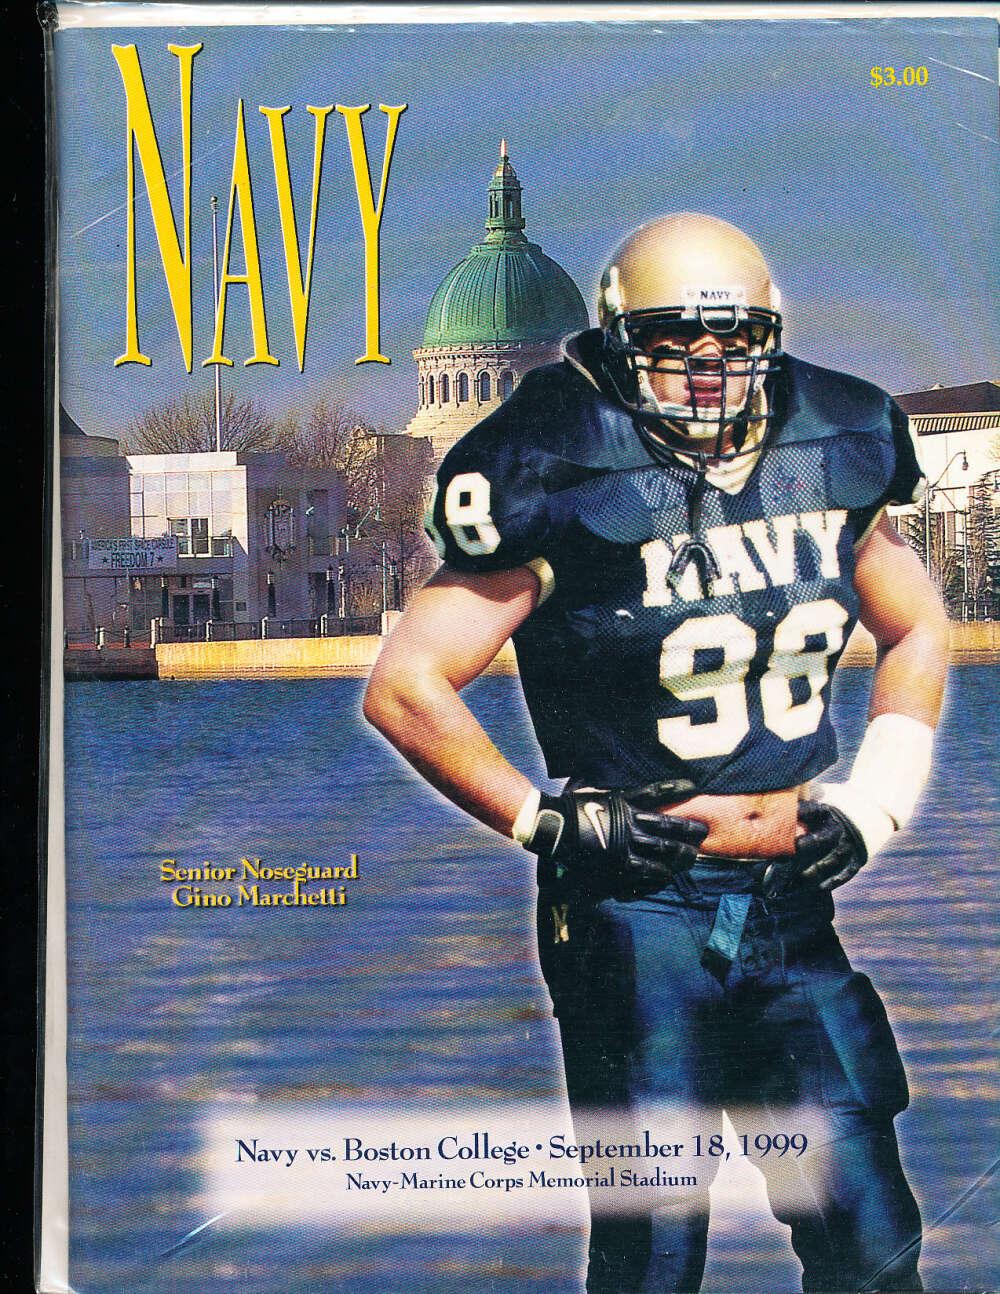 9/18 1999 Navy vs Boston College football program bx1